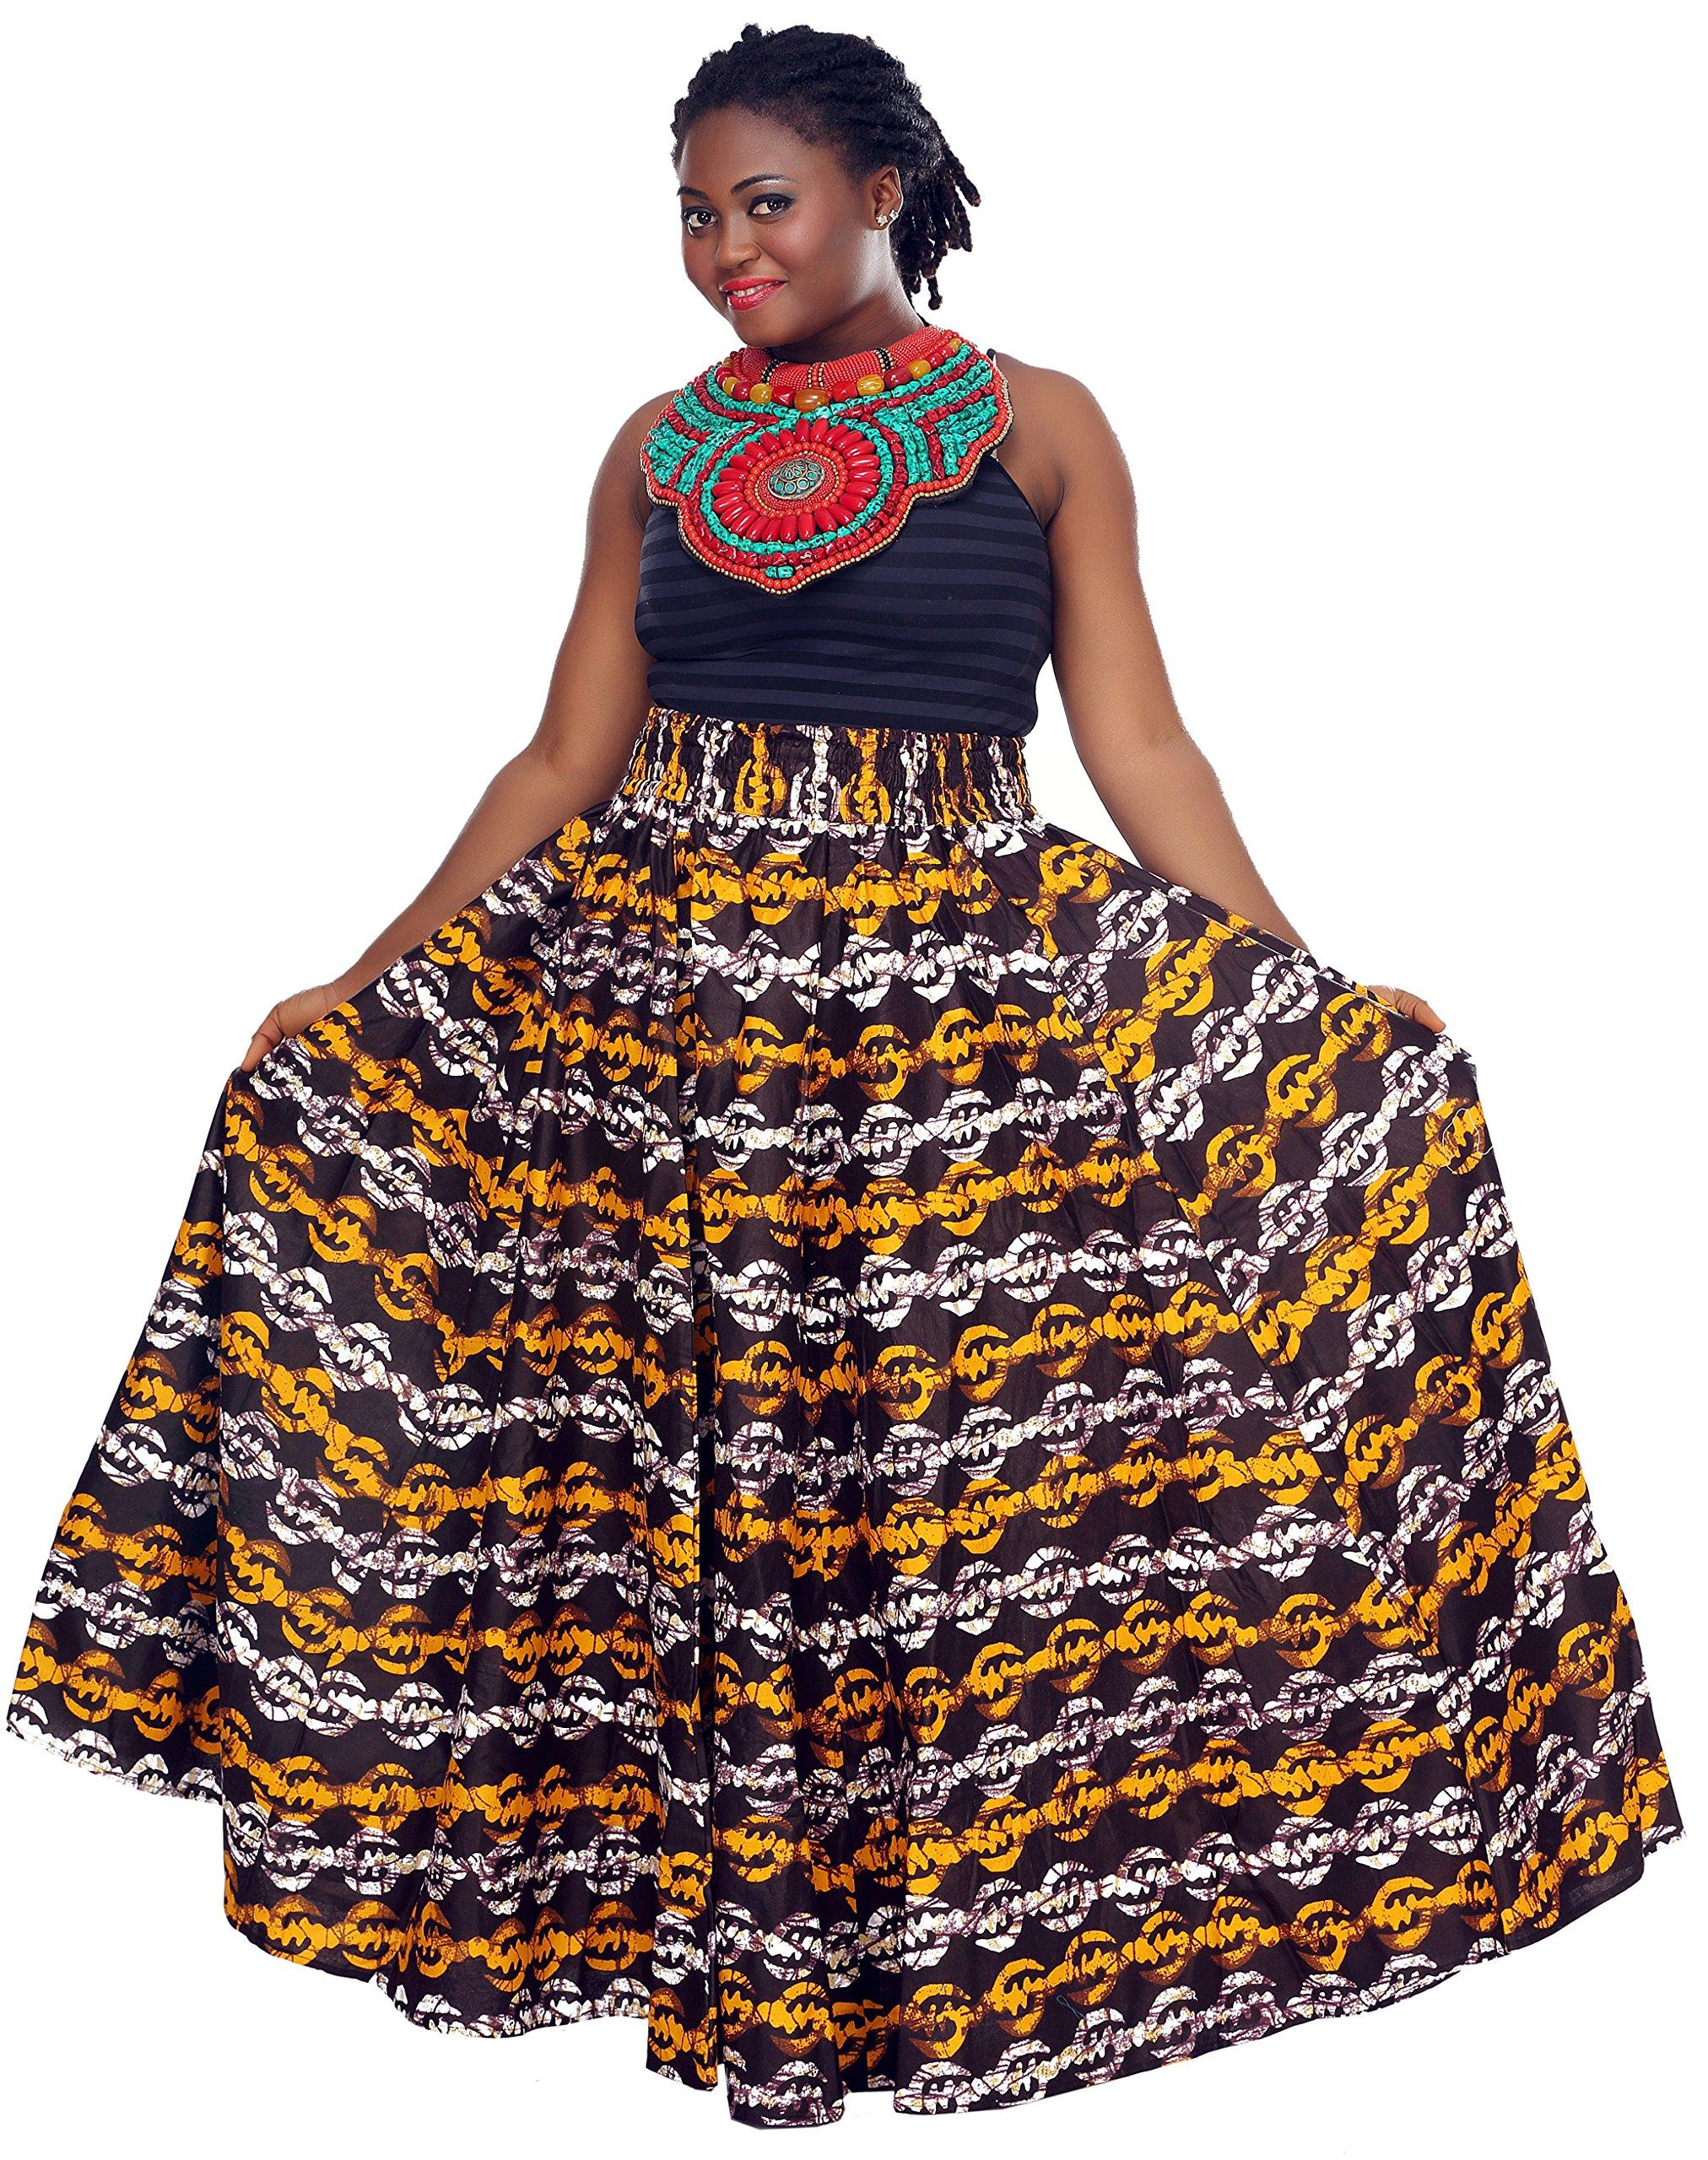 African Planet Women's Trees Cotton Wax Skirt Burundi Inspired Elastic Waist Maxi